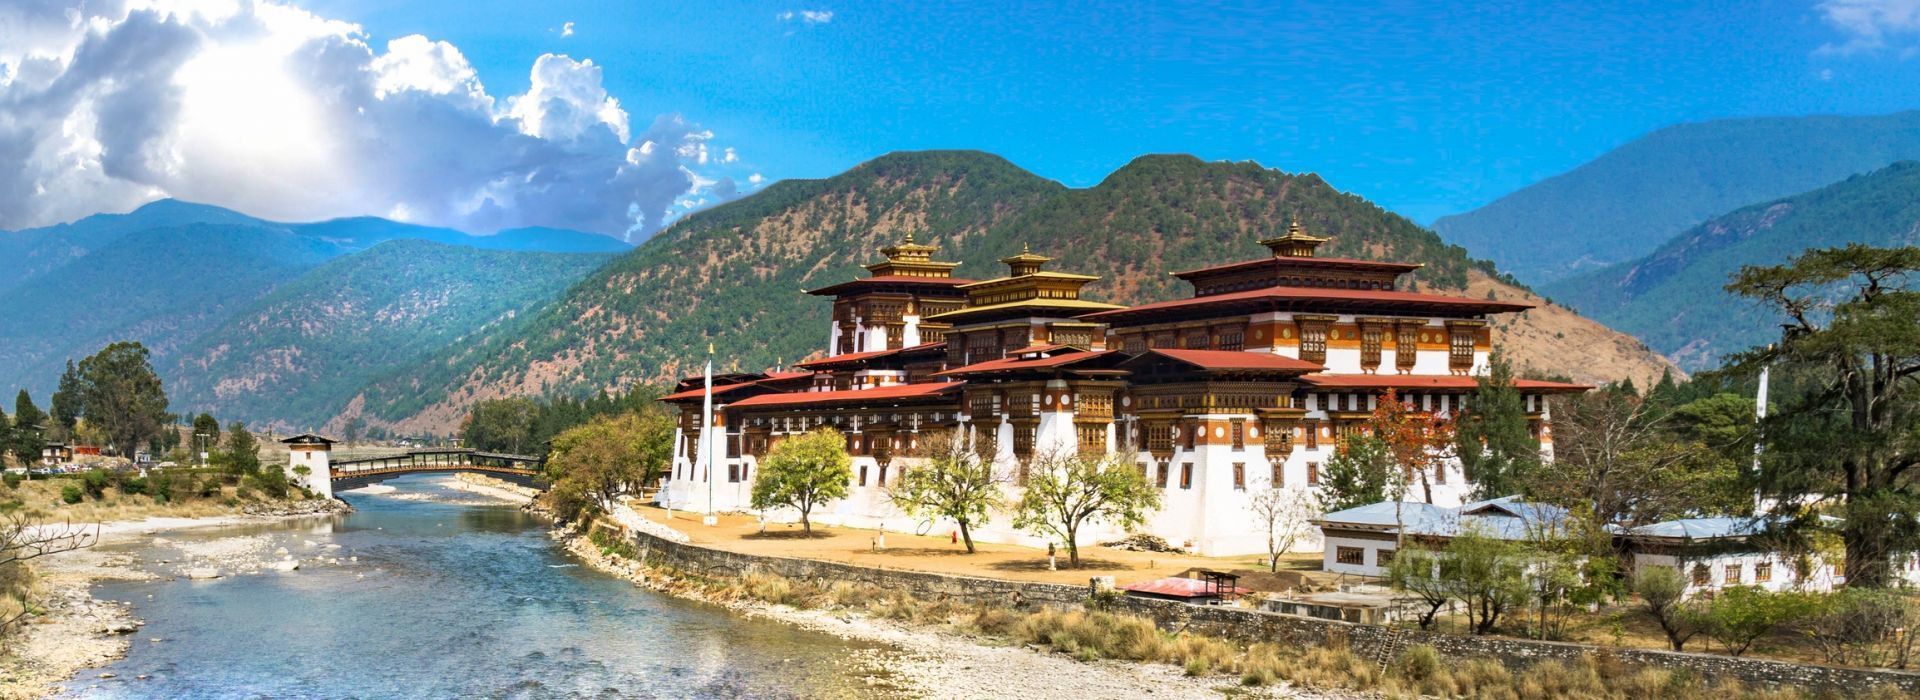 Sightseeing Tours in Thimphu